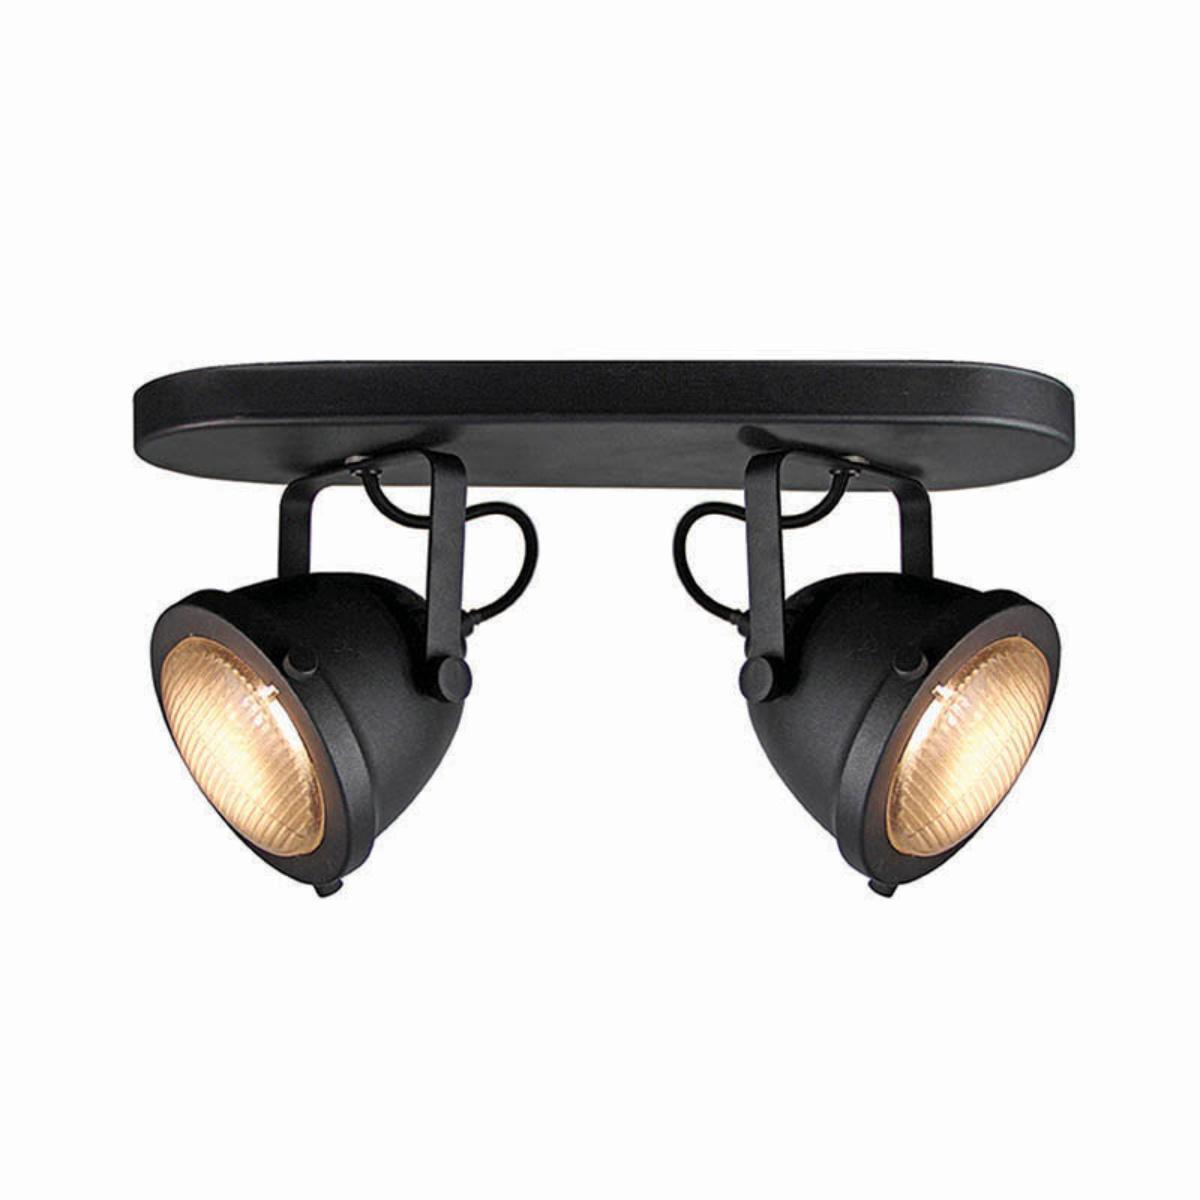 LABEL51 LED Spot 'Moto' 2-lichts, kleur zwart